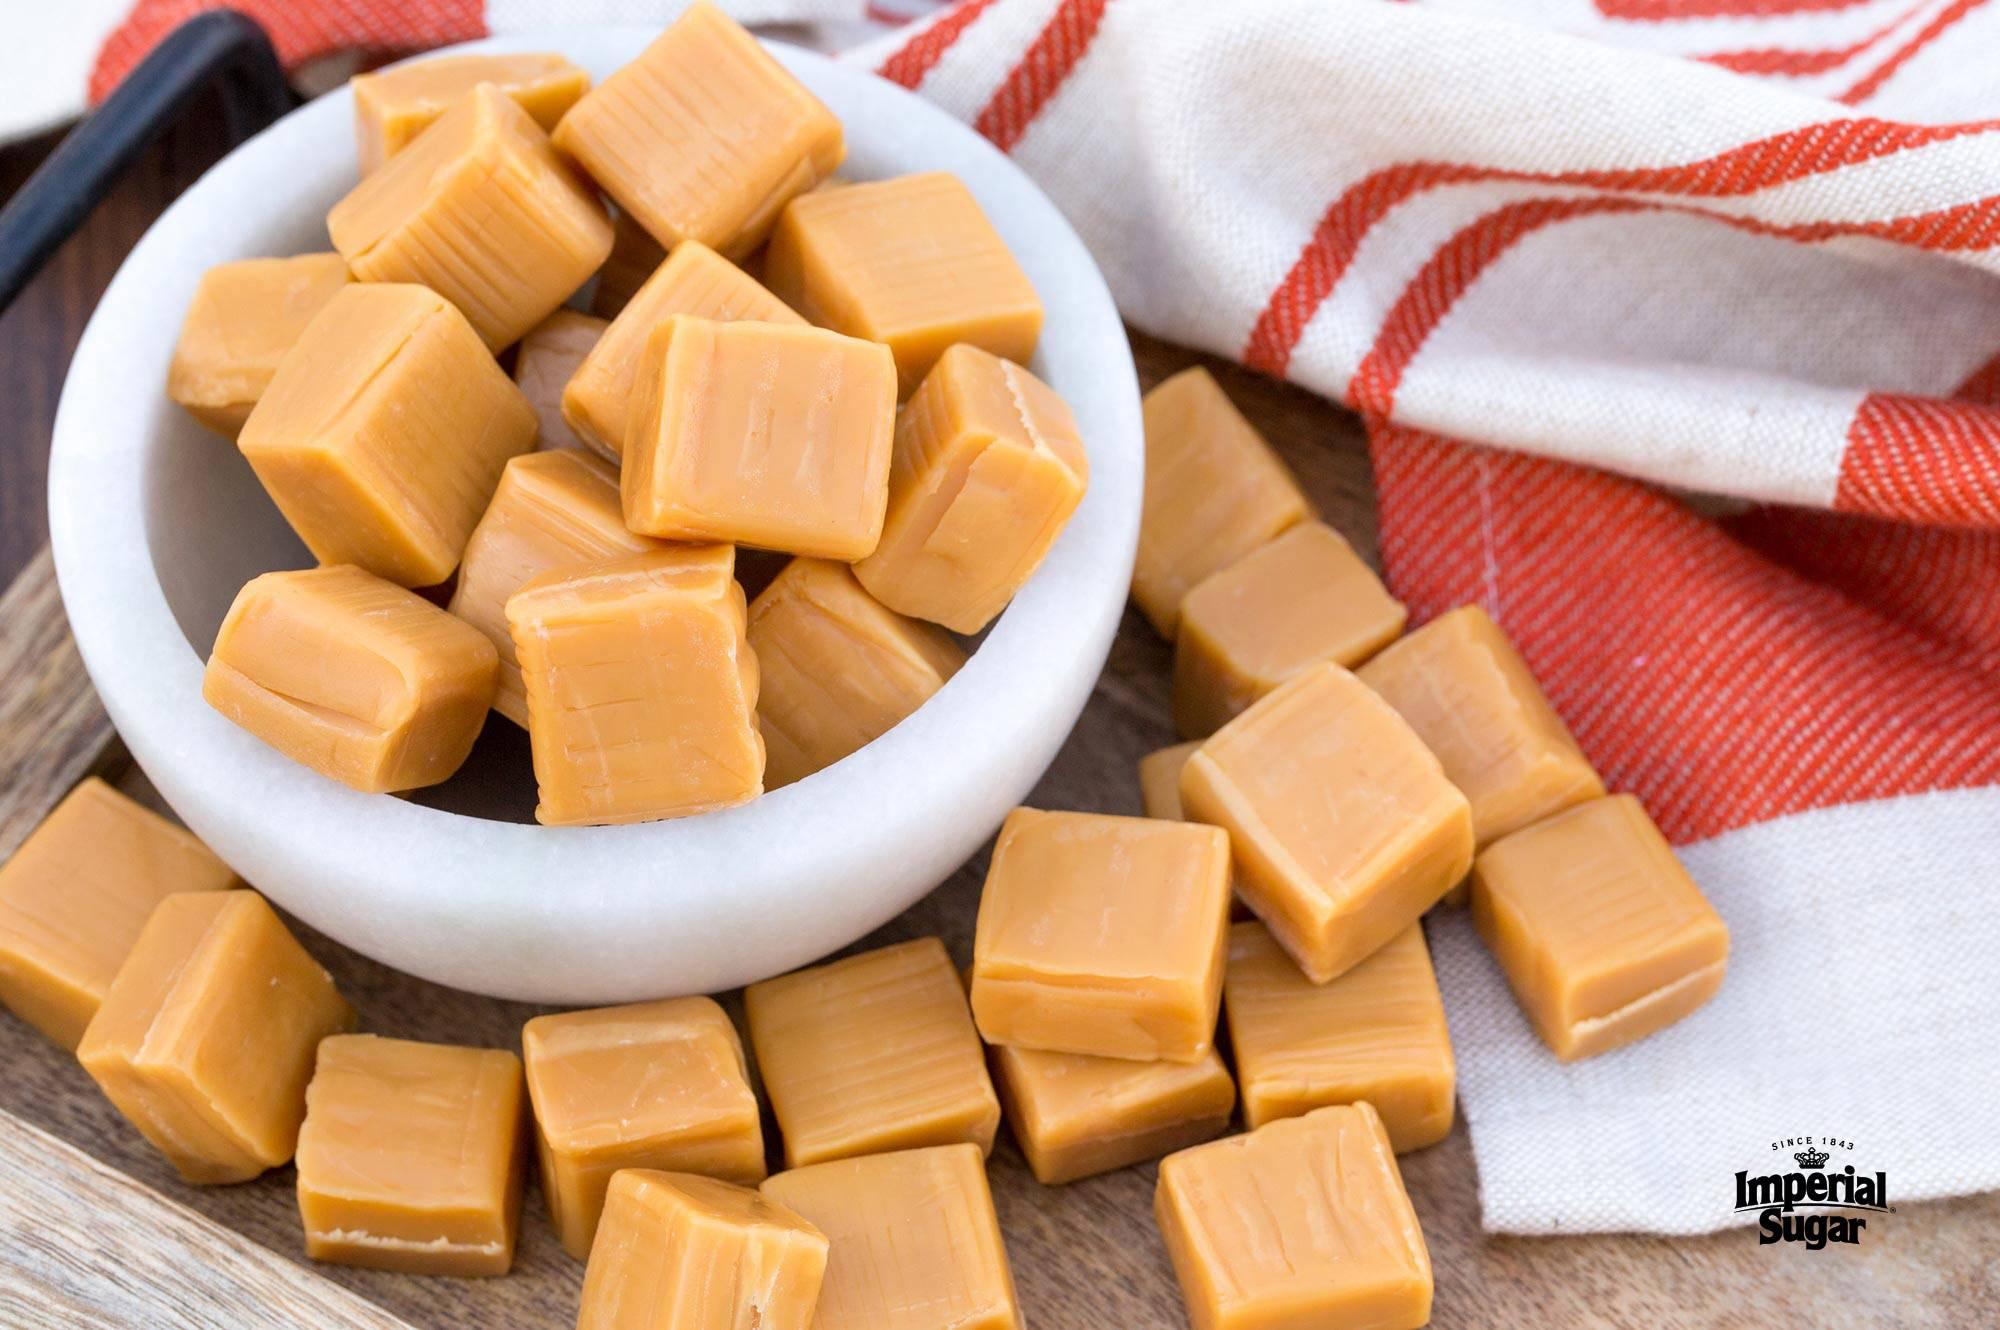 Butterscotch Candy Imperial Sugar